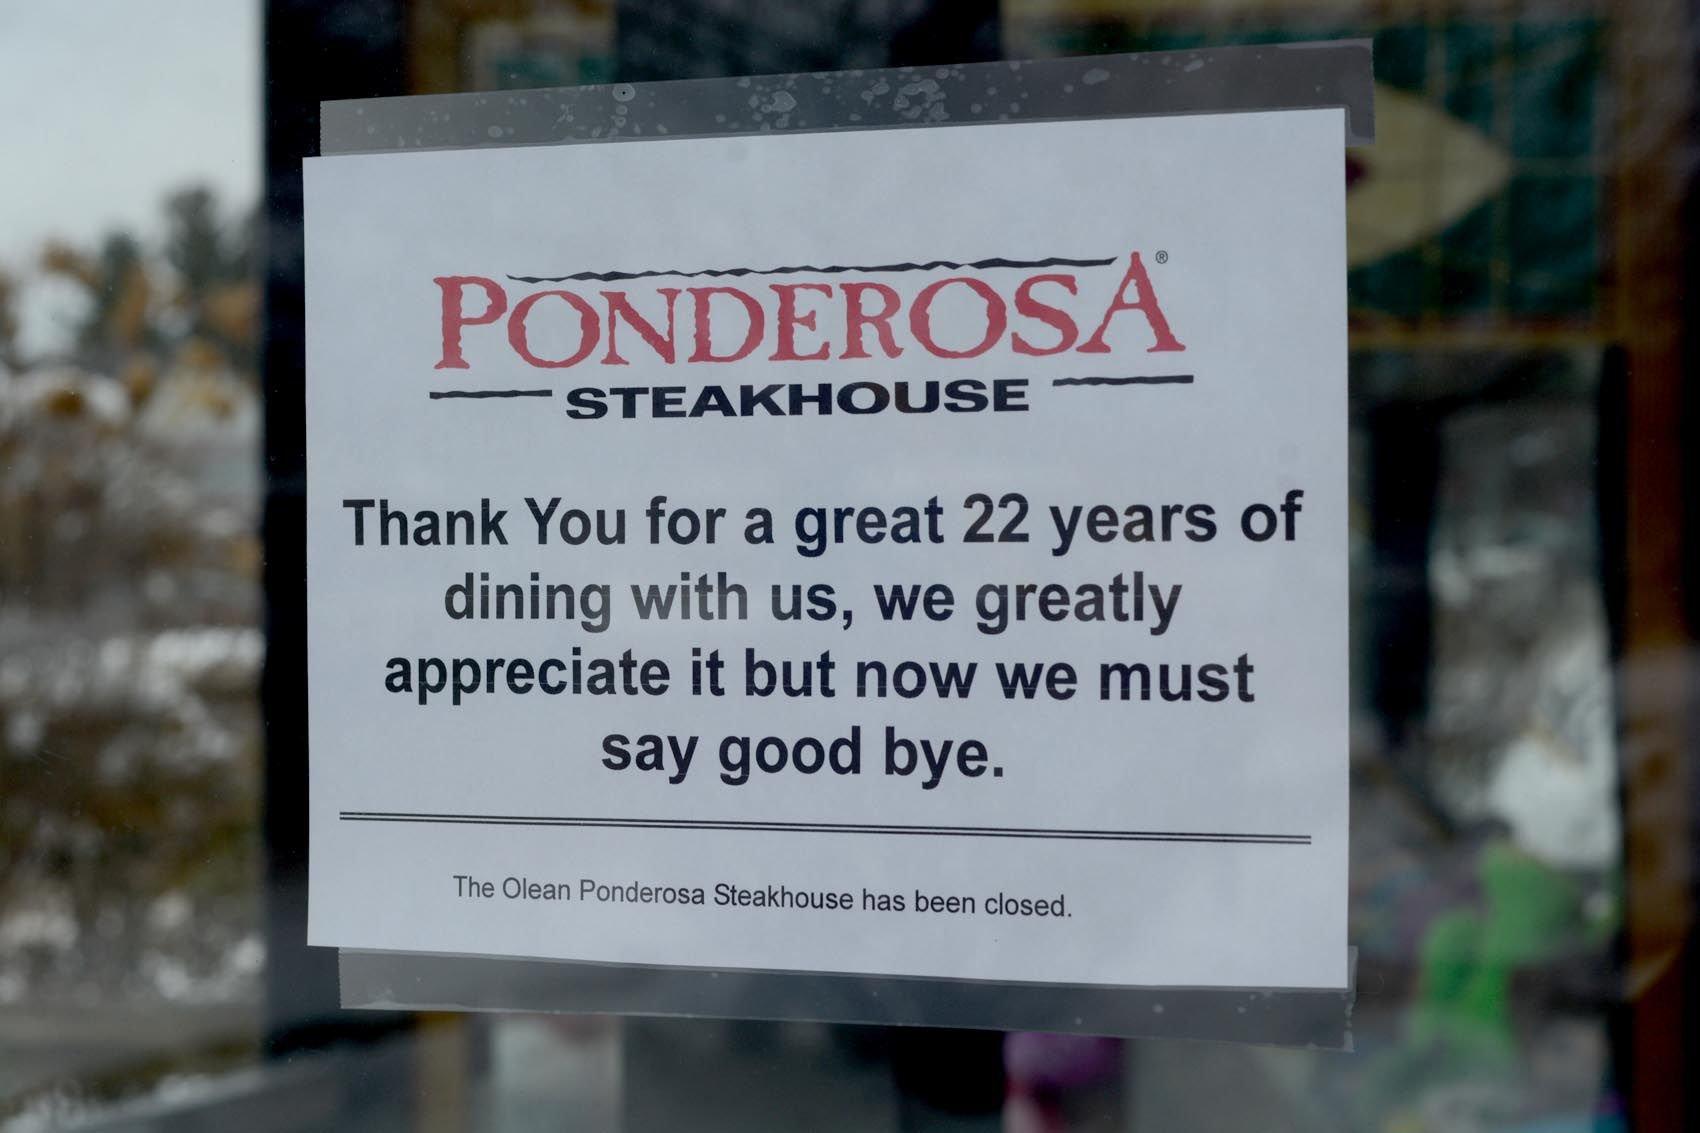 ponderosa coupons tell city indiana